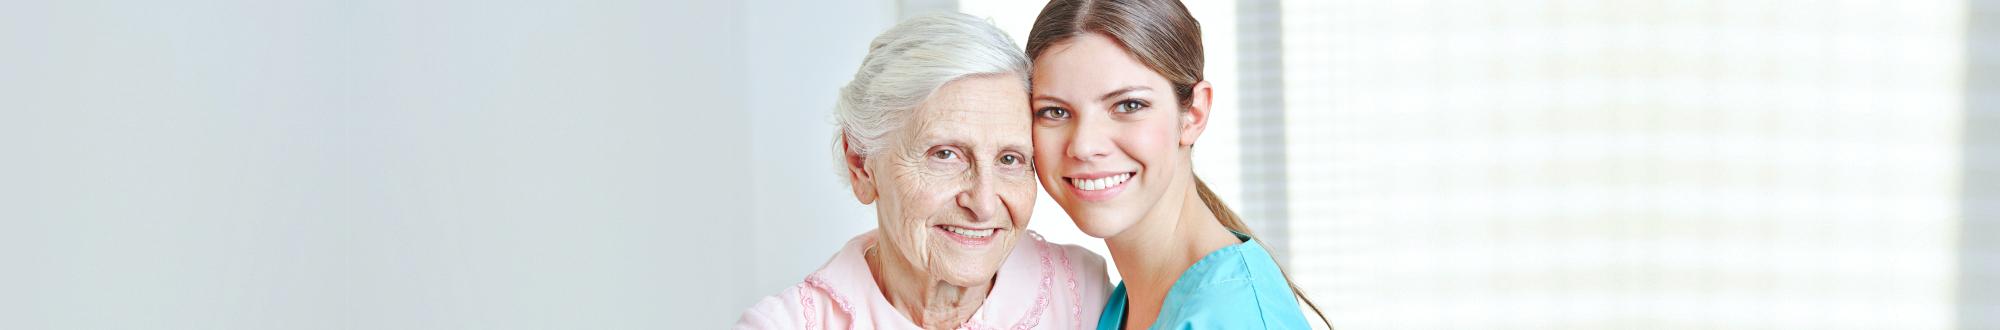 caregiver and senior woman smiling indoor